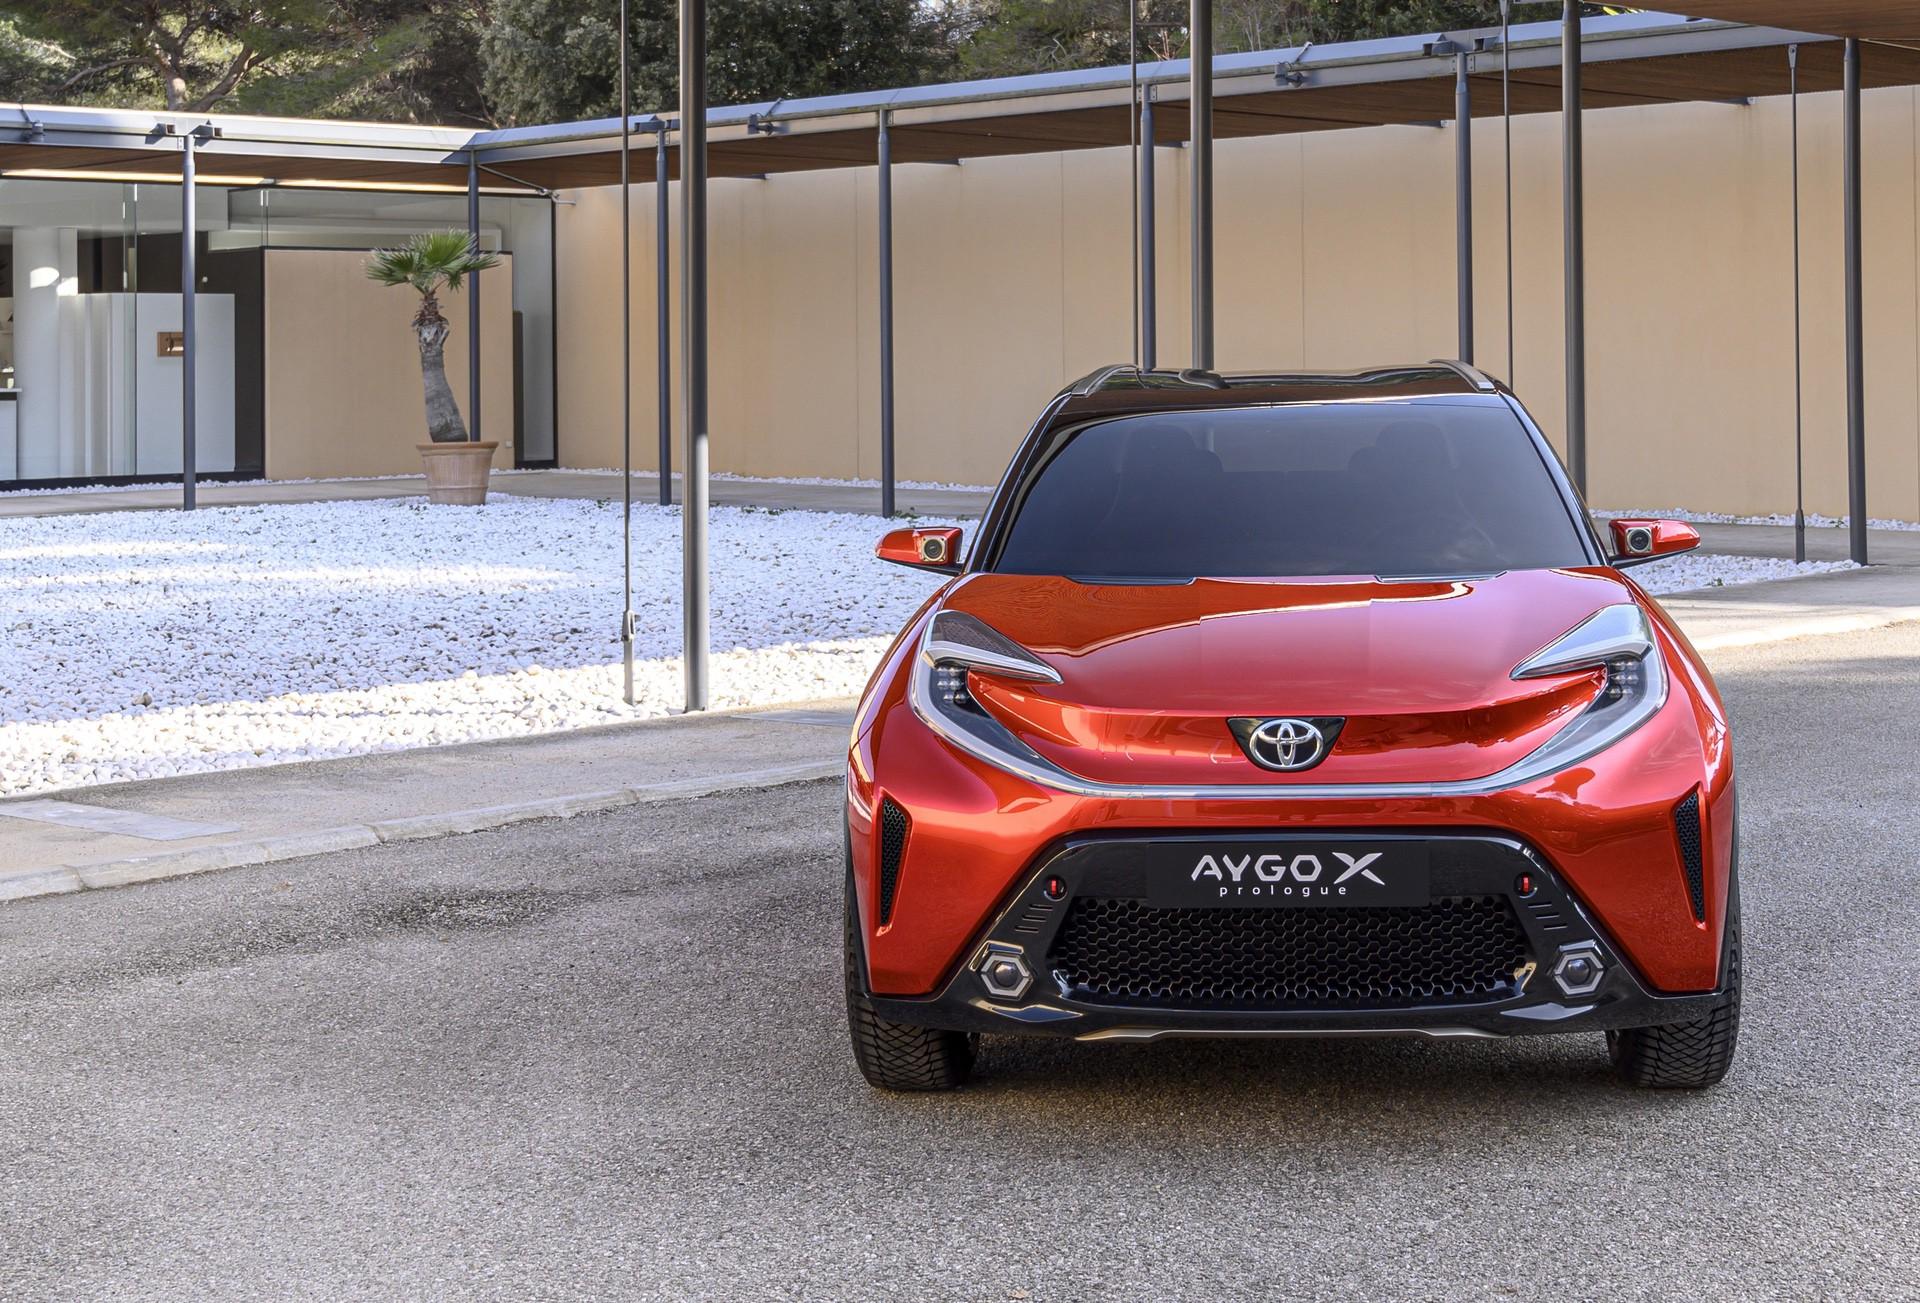 Toyota_Aygo_X_prologue-0002